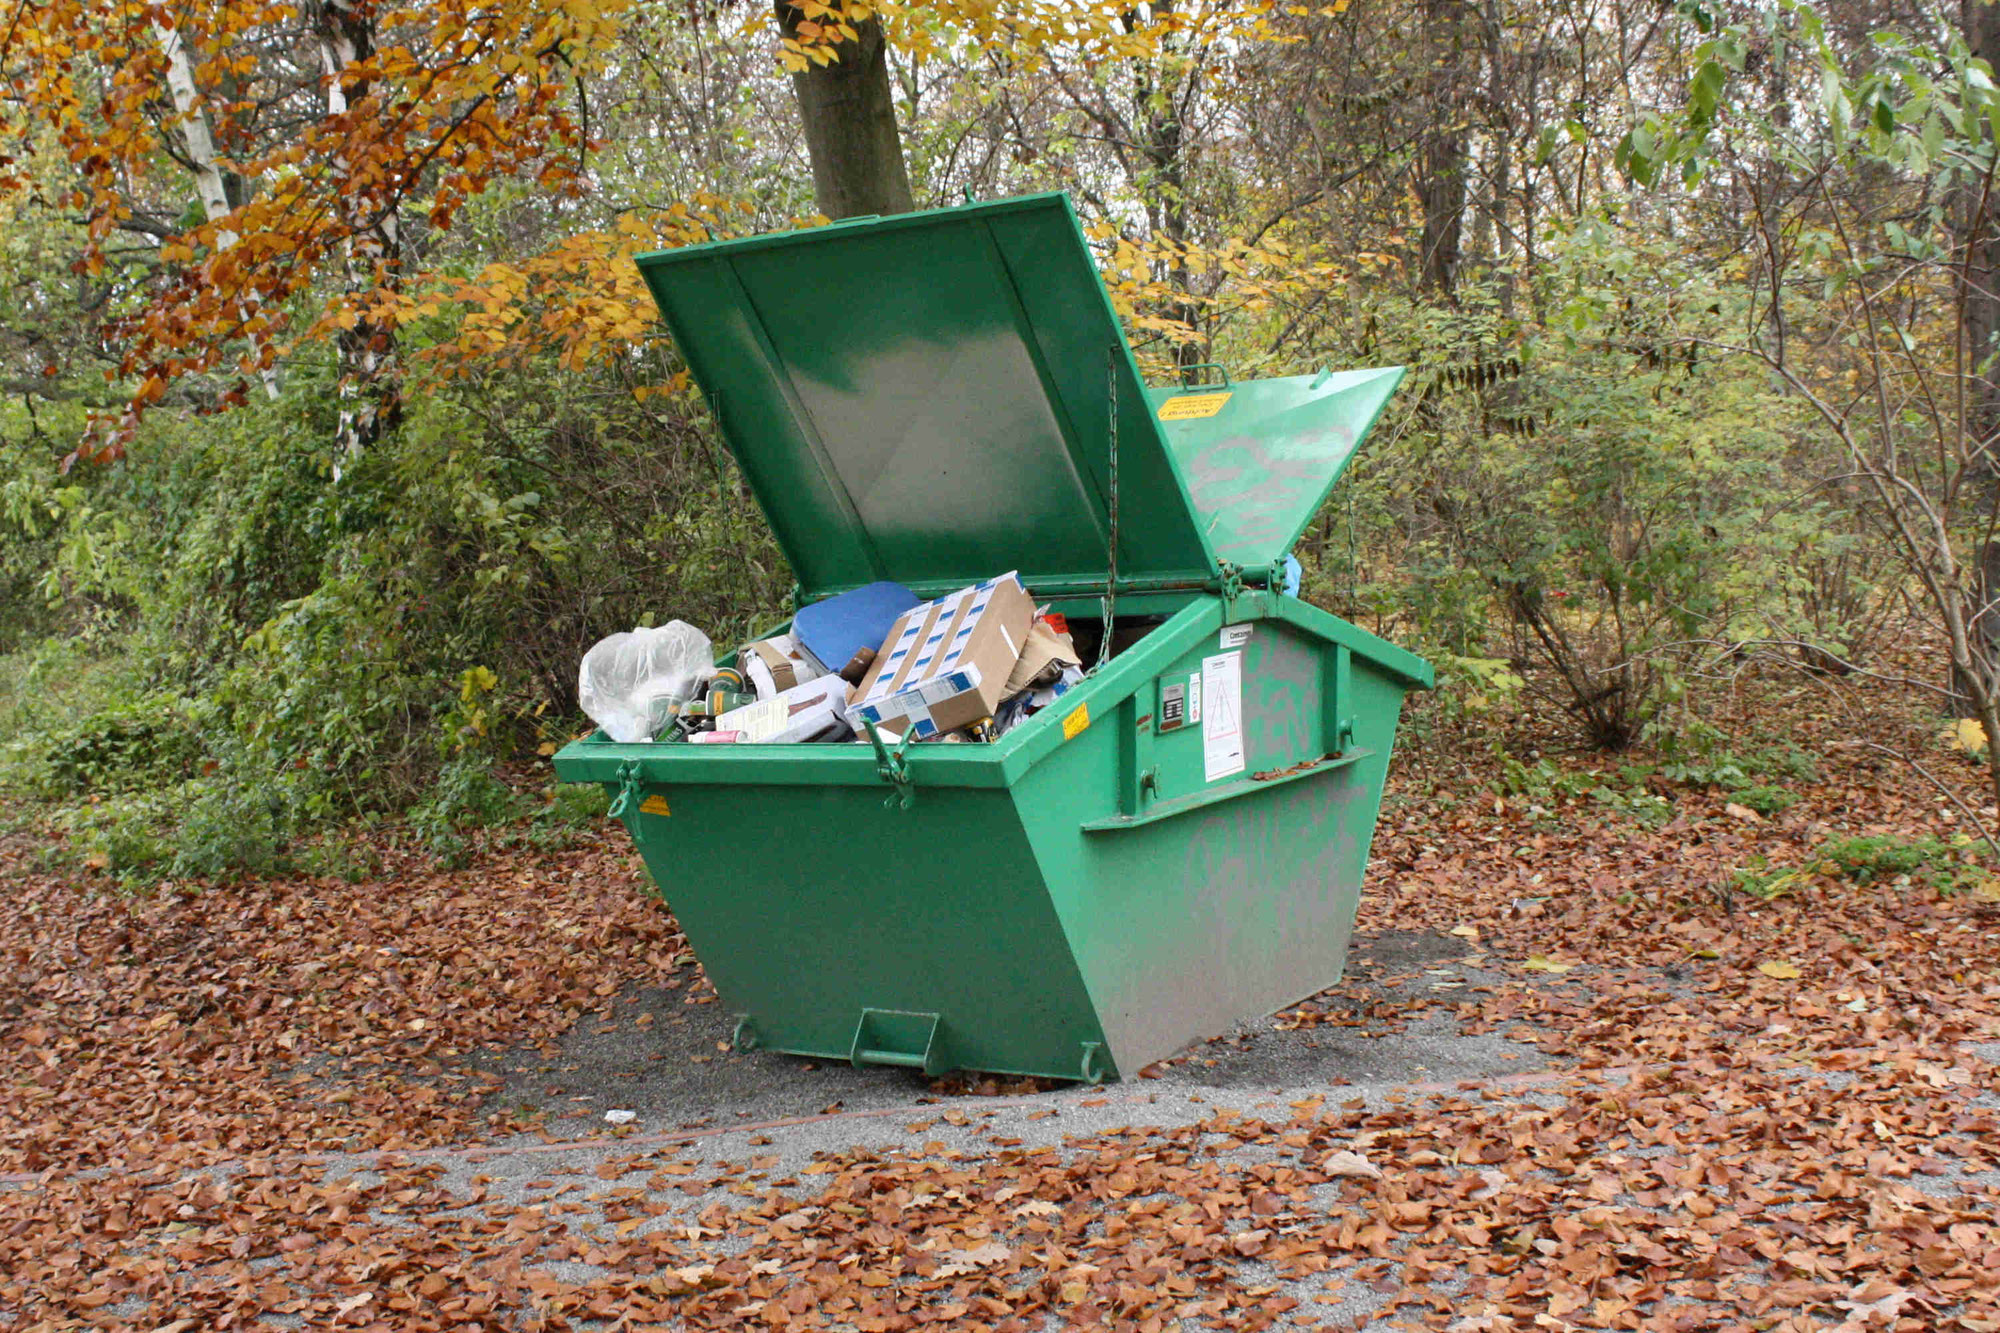 Bunter Montag: Der Umgang mit Abfall